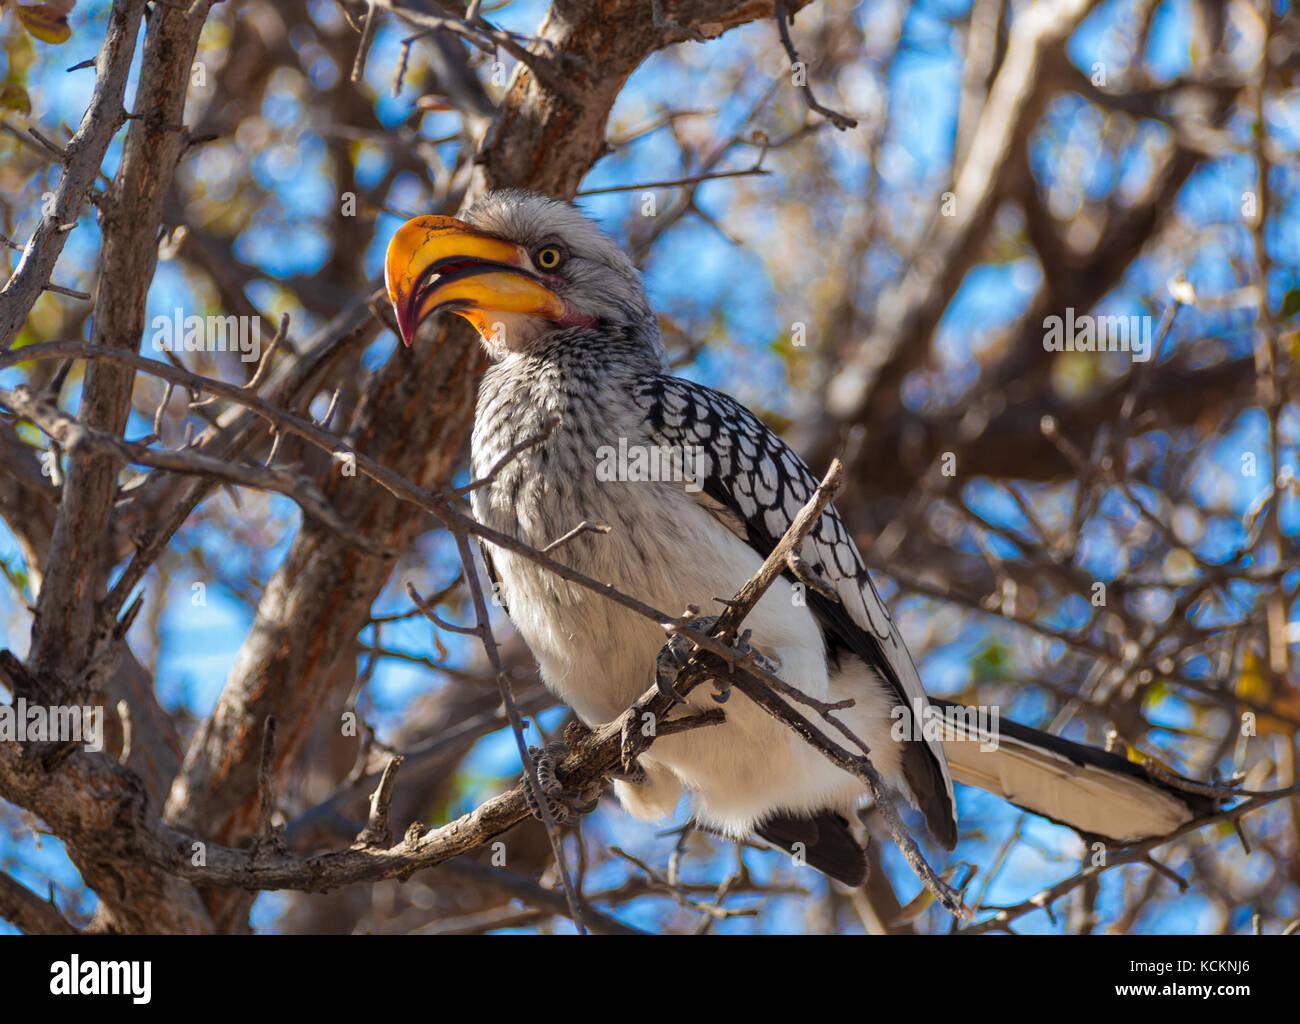 Hornbill in the Central Kalahari Game Reserve, Botswana - Stock Image